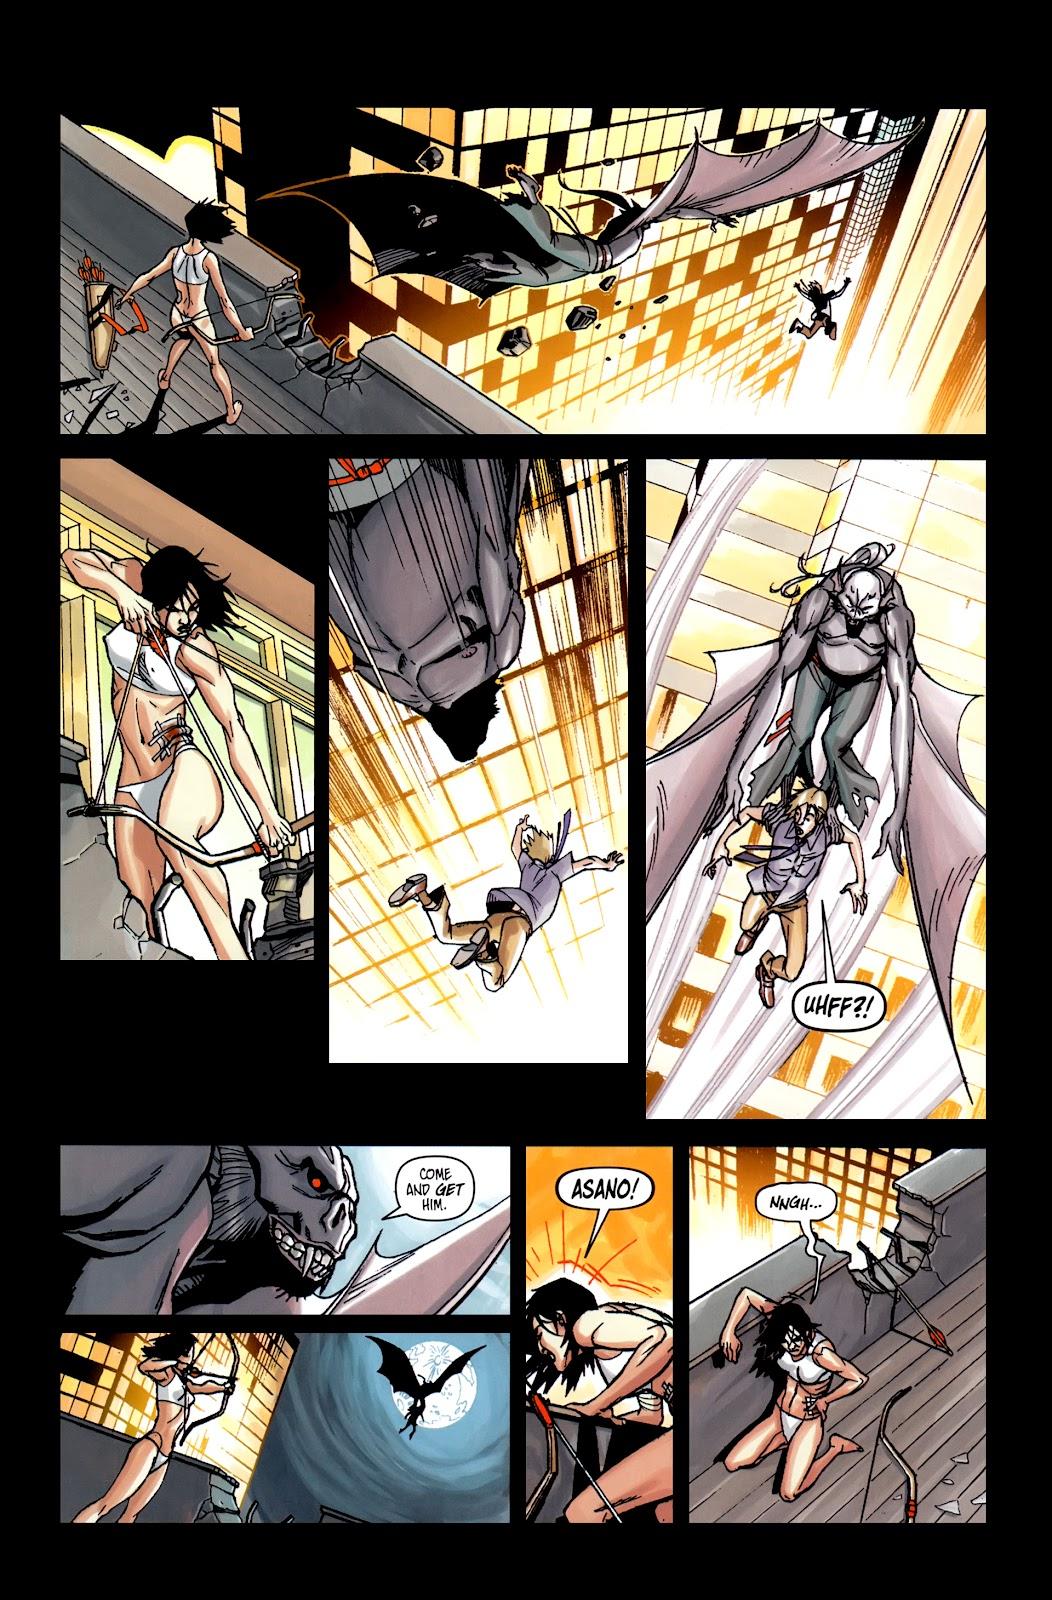 Read online Shinku comic -  Issue #5 - 8